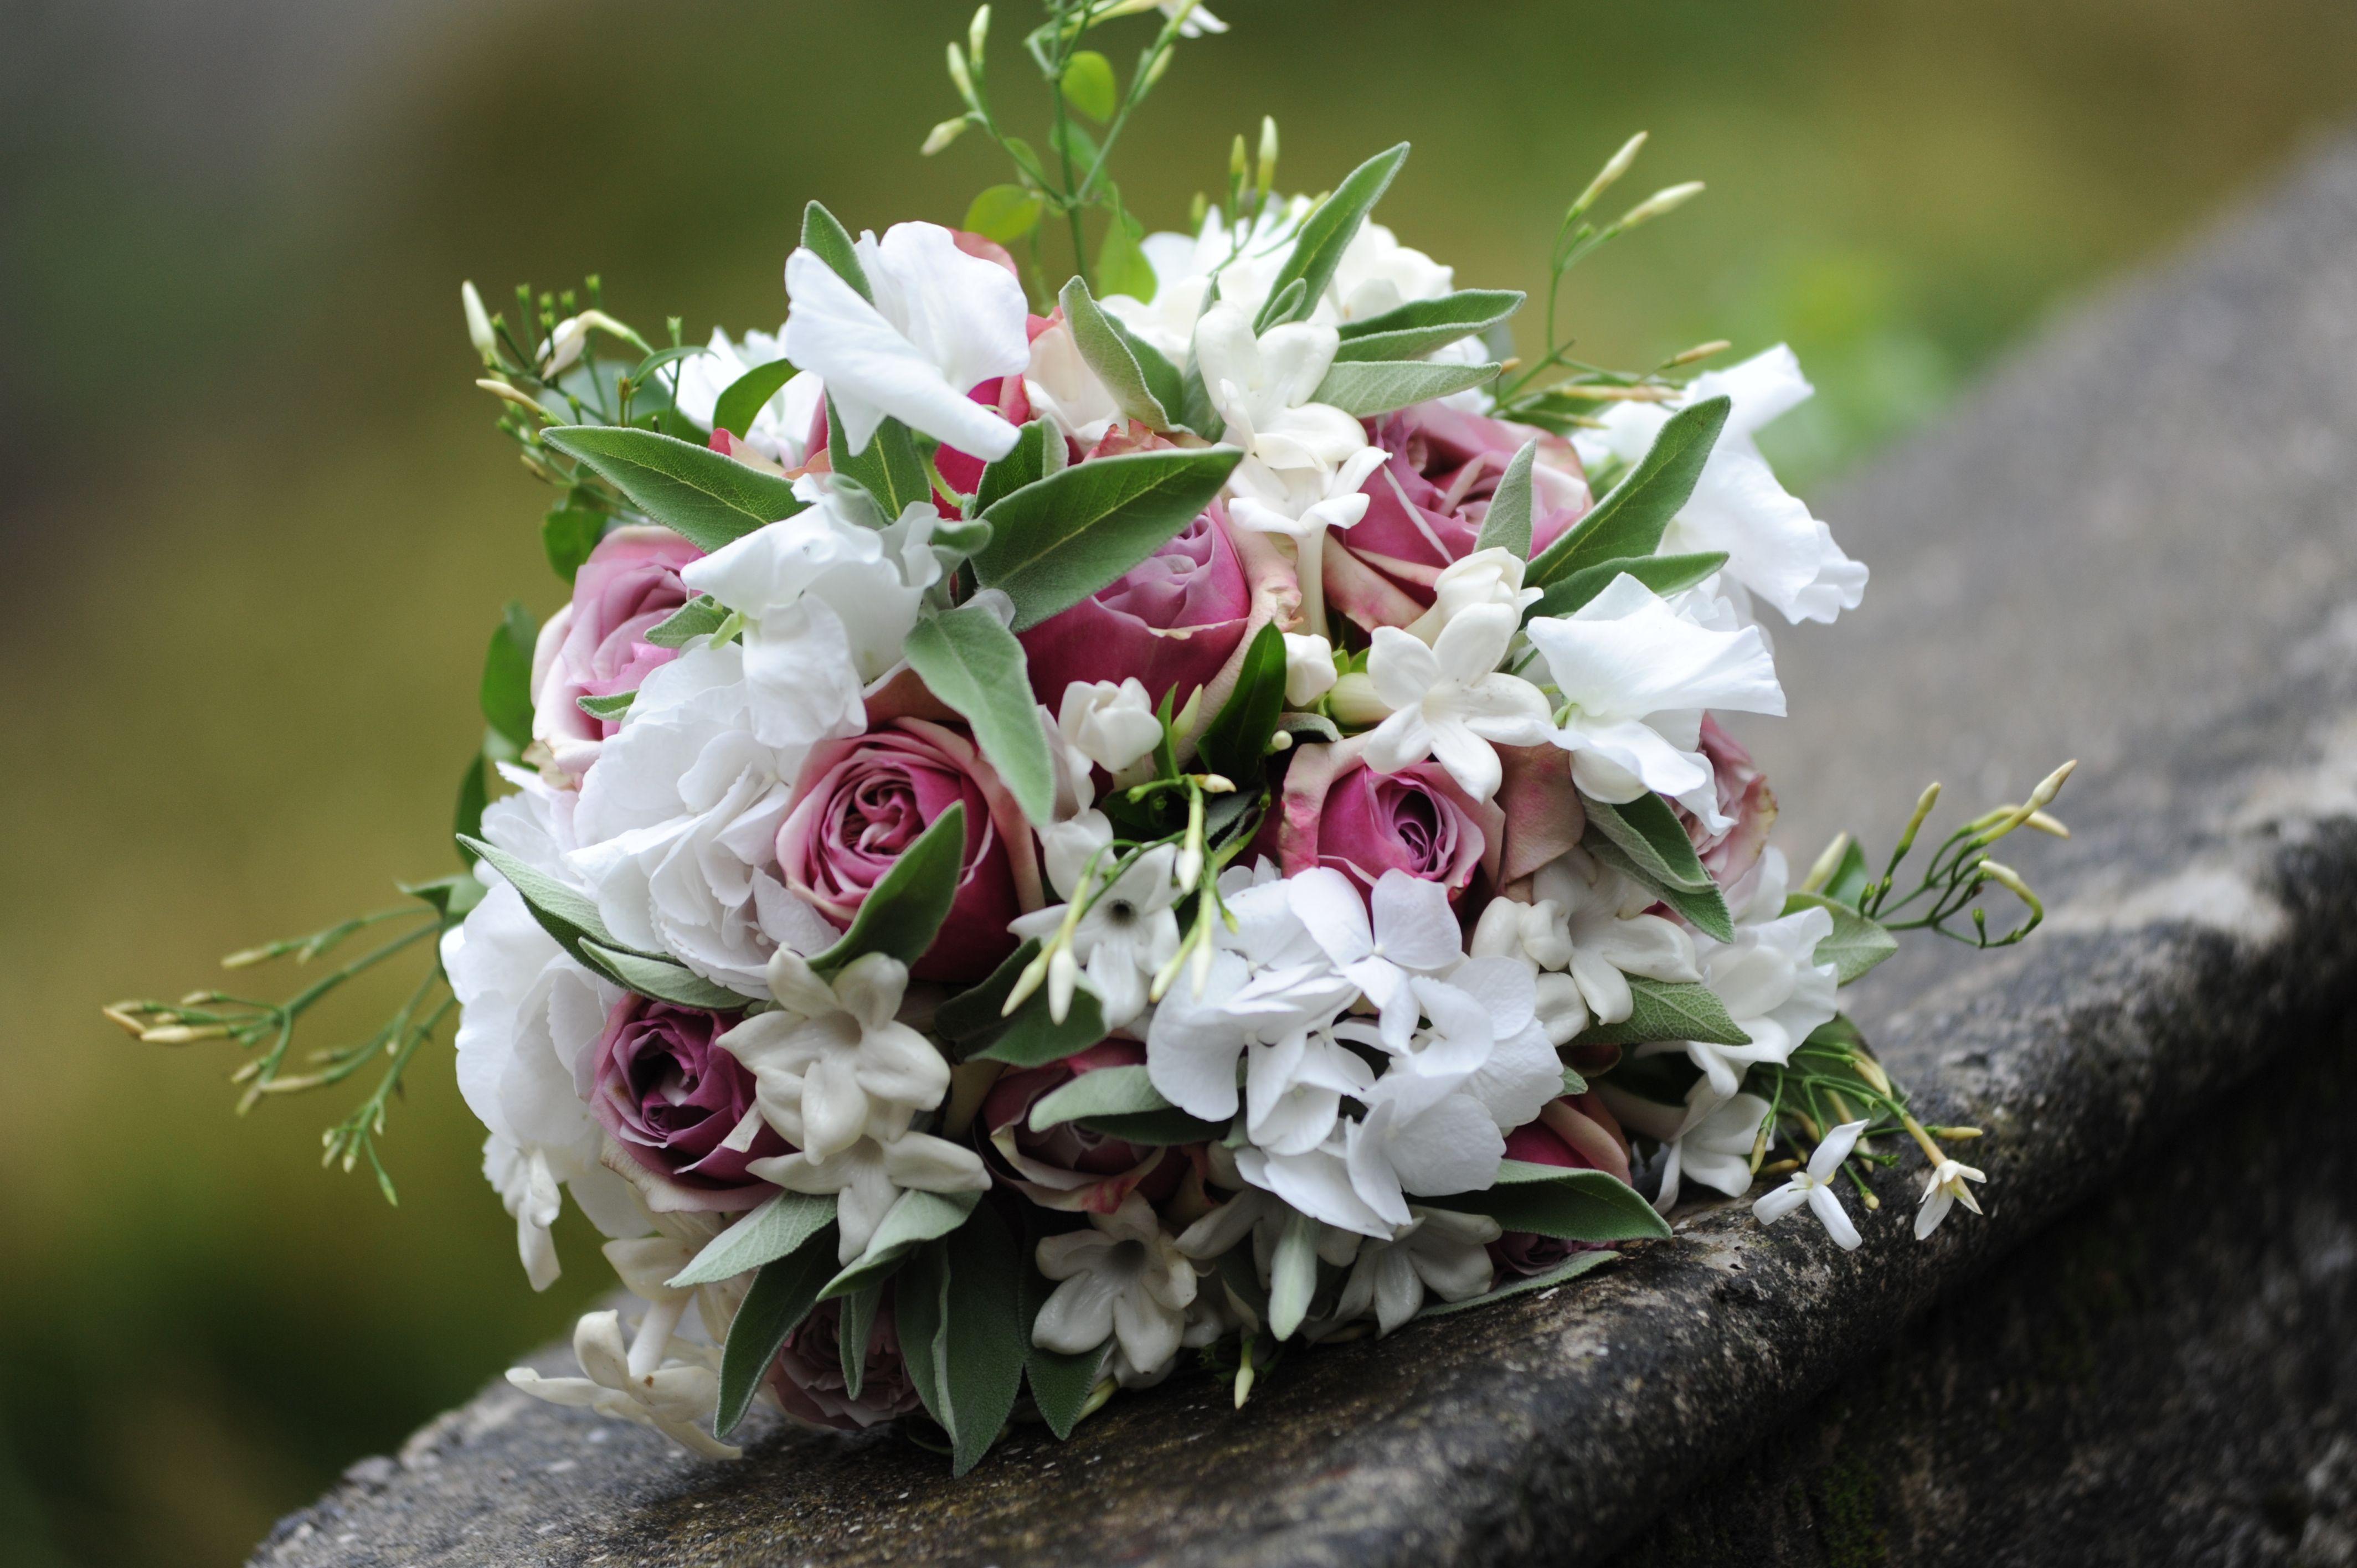 Gelsomino Bouquet Sposa.Un Bouquet Boho Chic Con Rose Gelsomino Ortensie Pisello